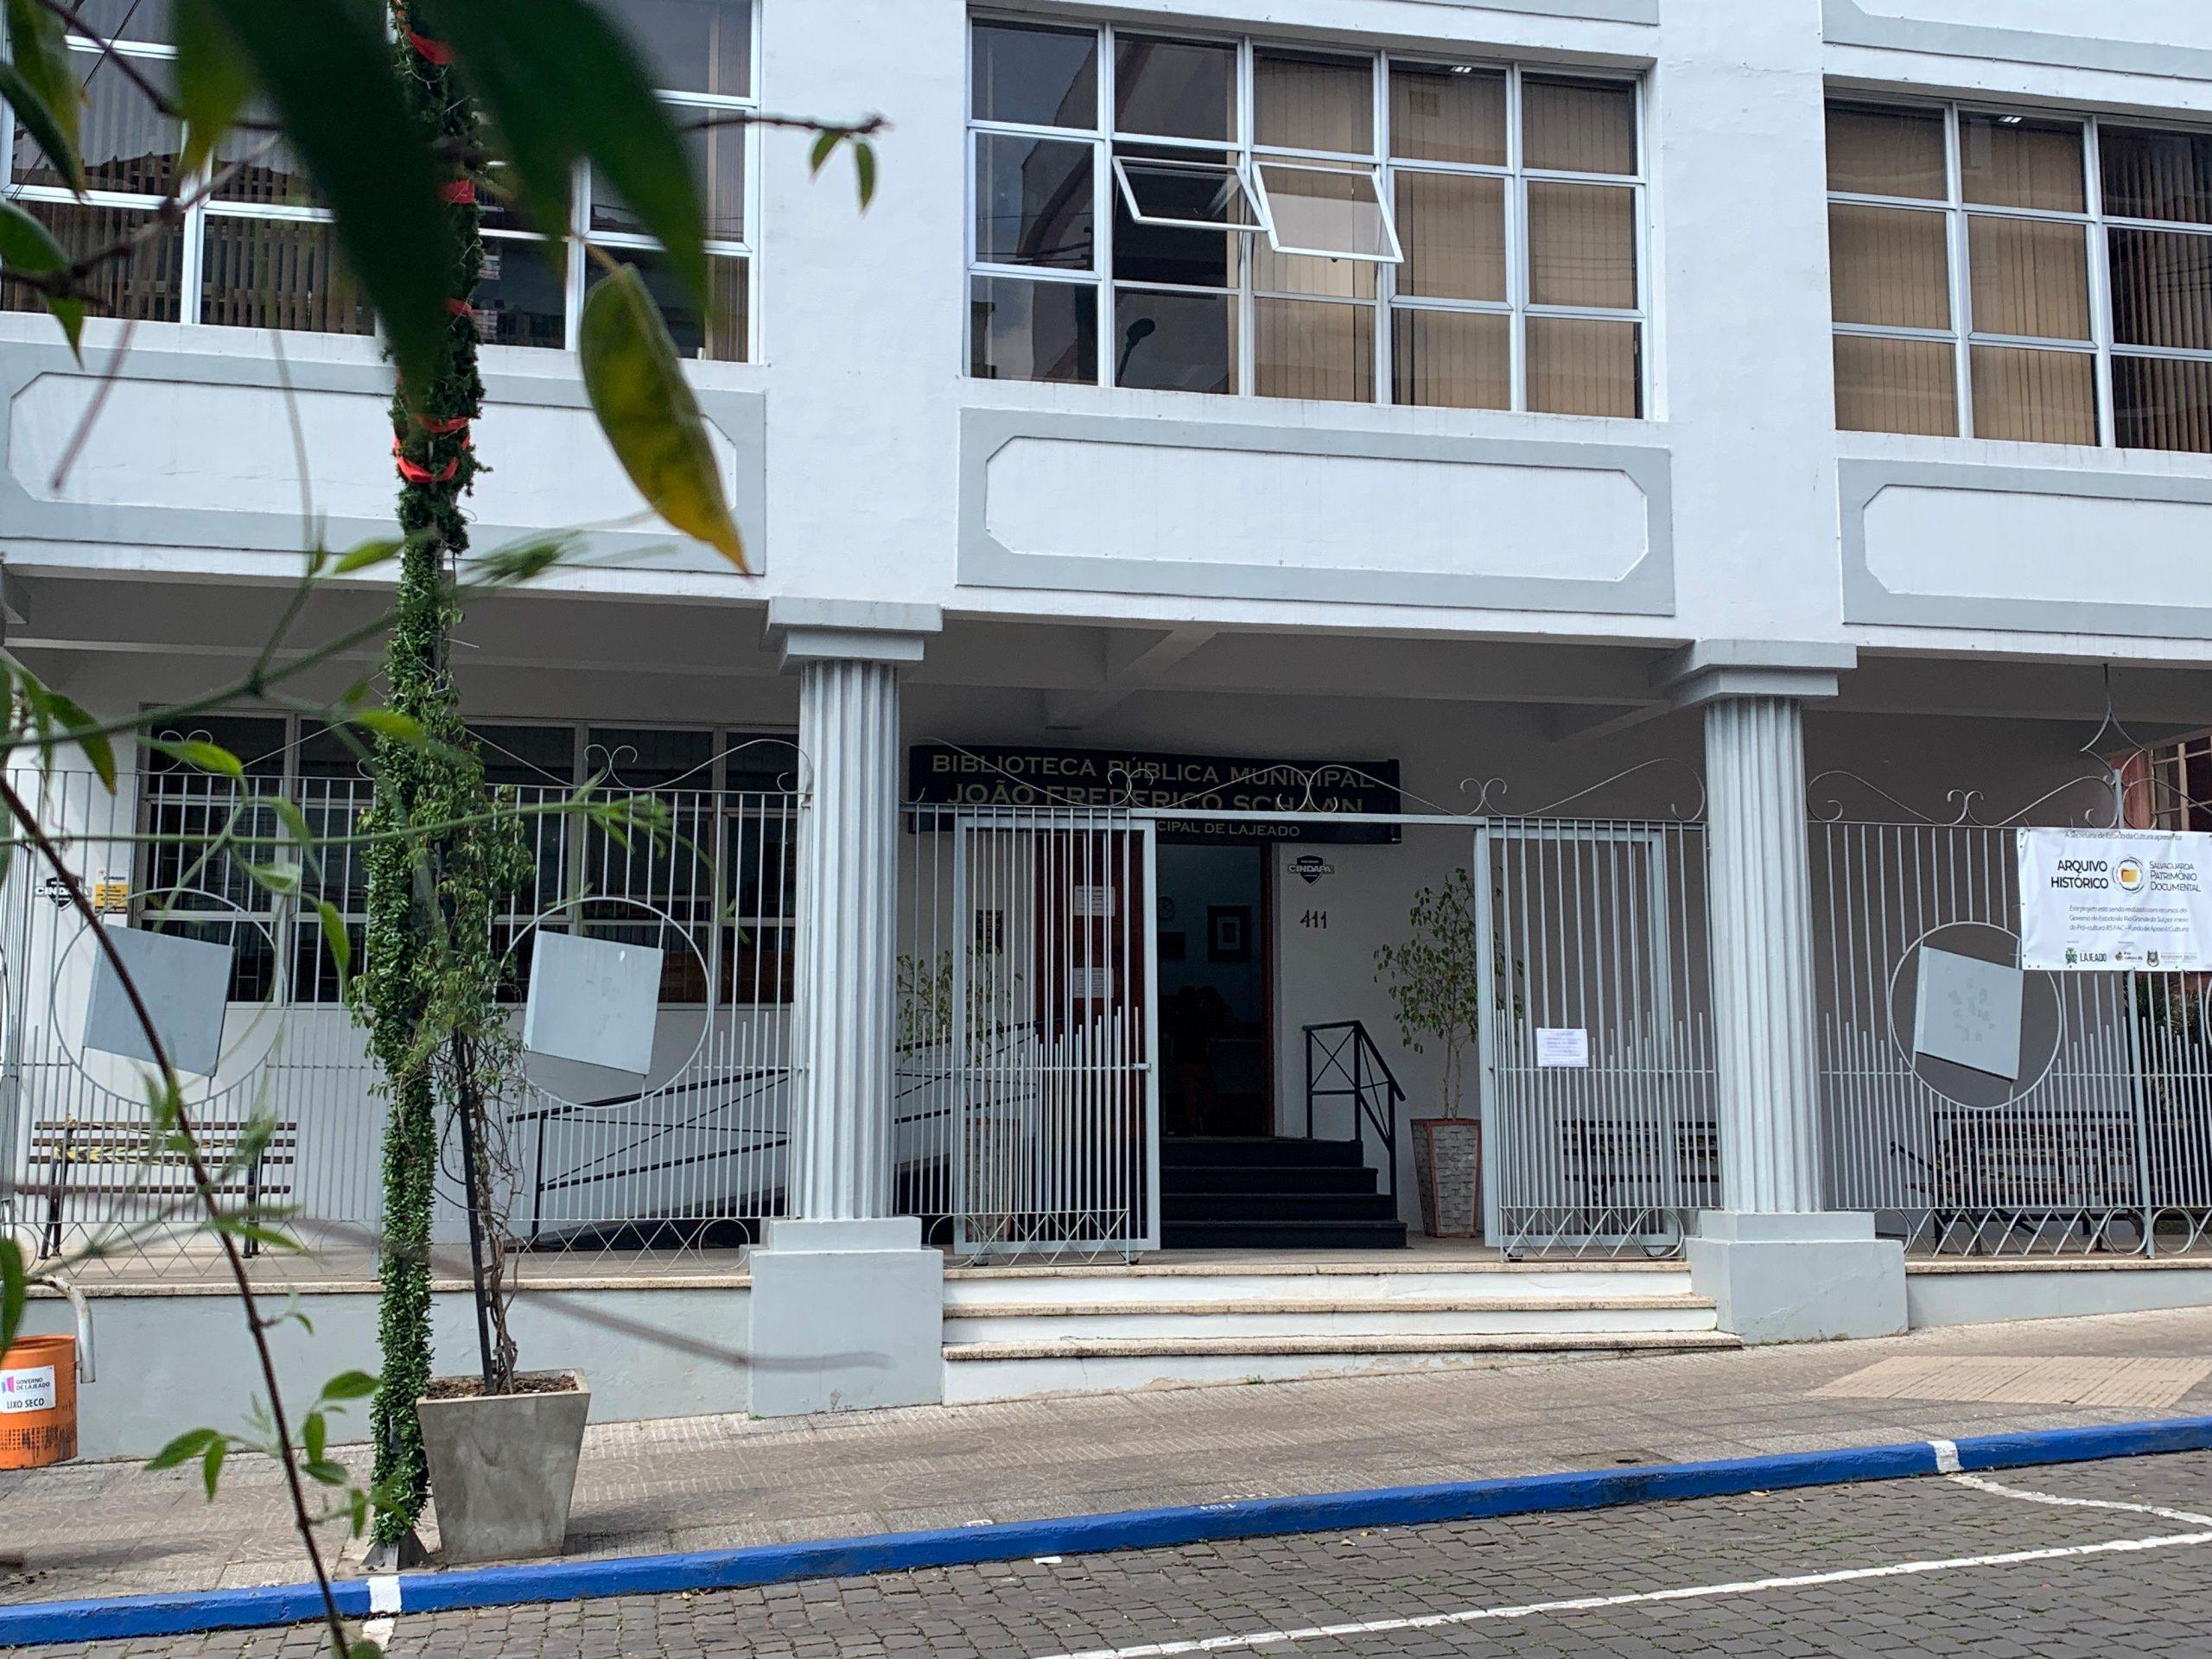 Biblioteca Pública de Lajeado está fechada temporariamente